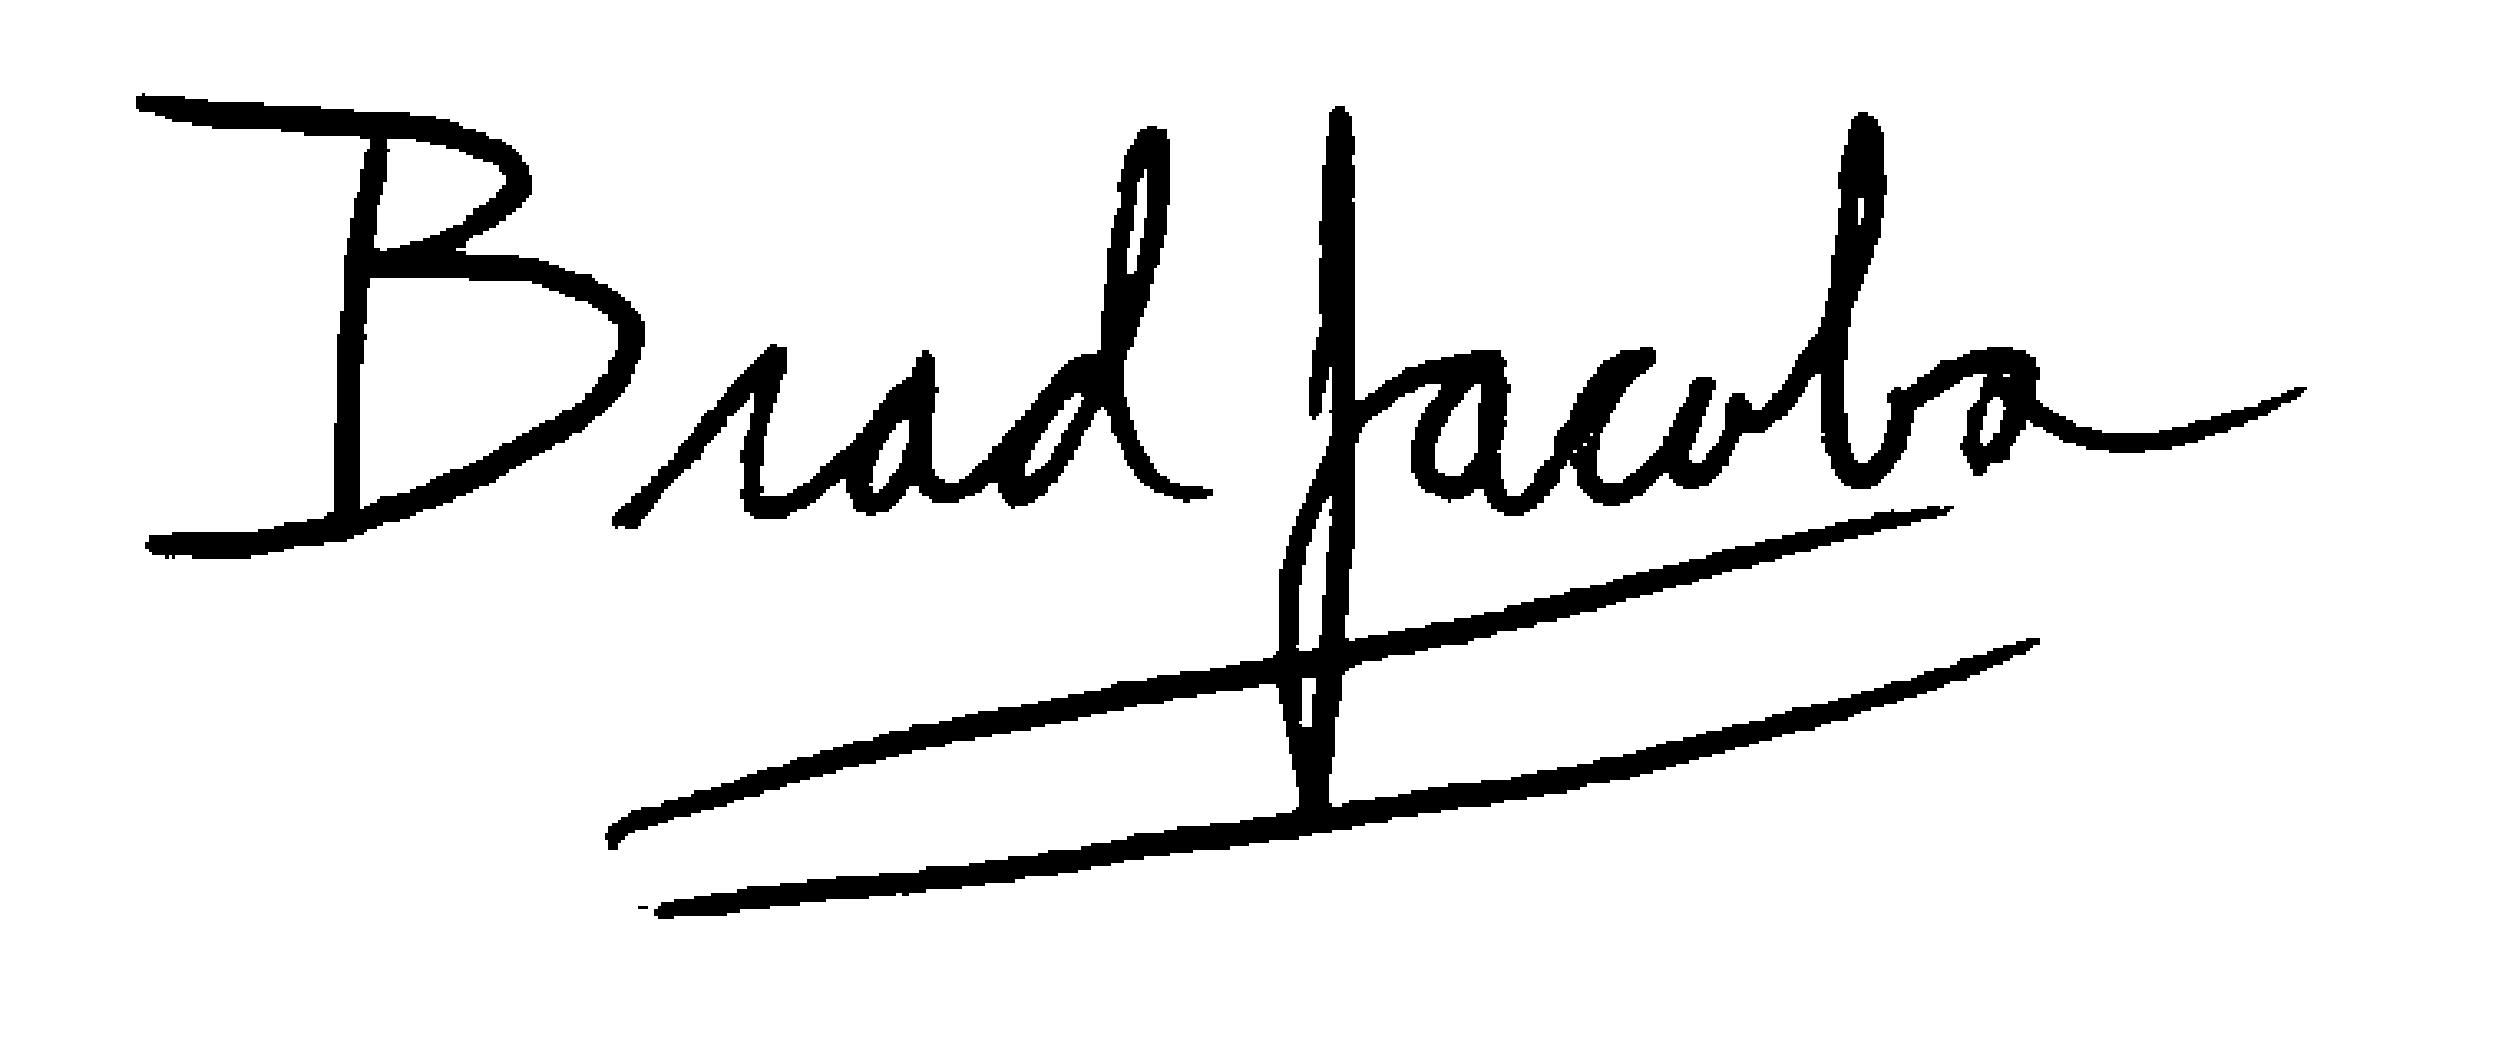 Brad Jacobs